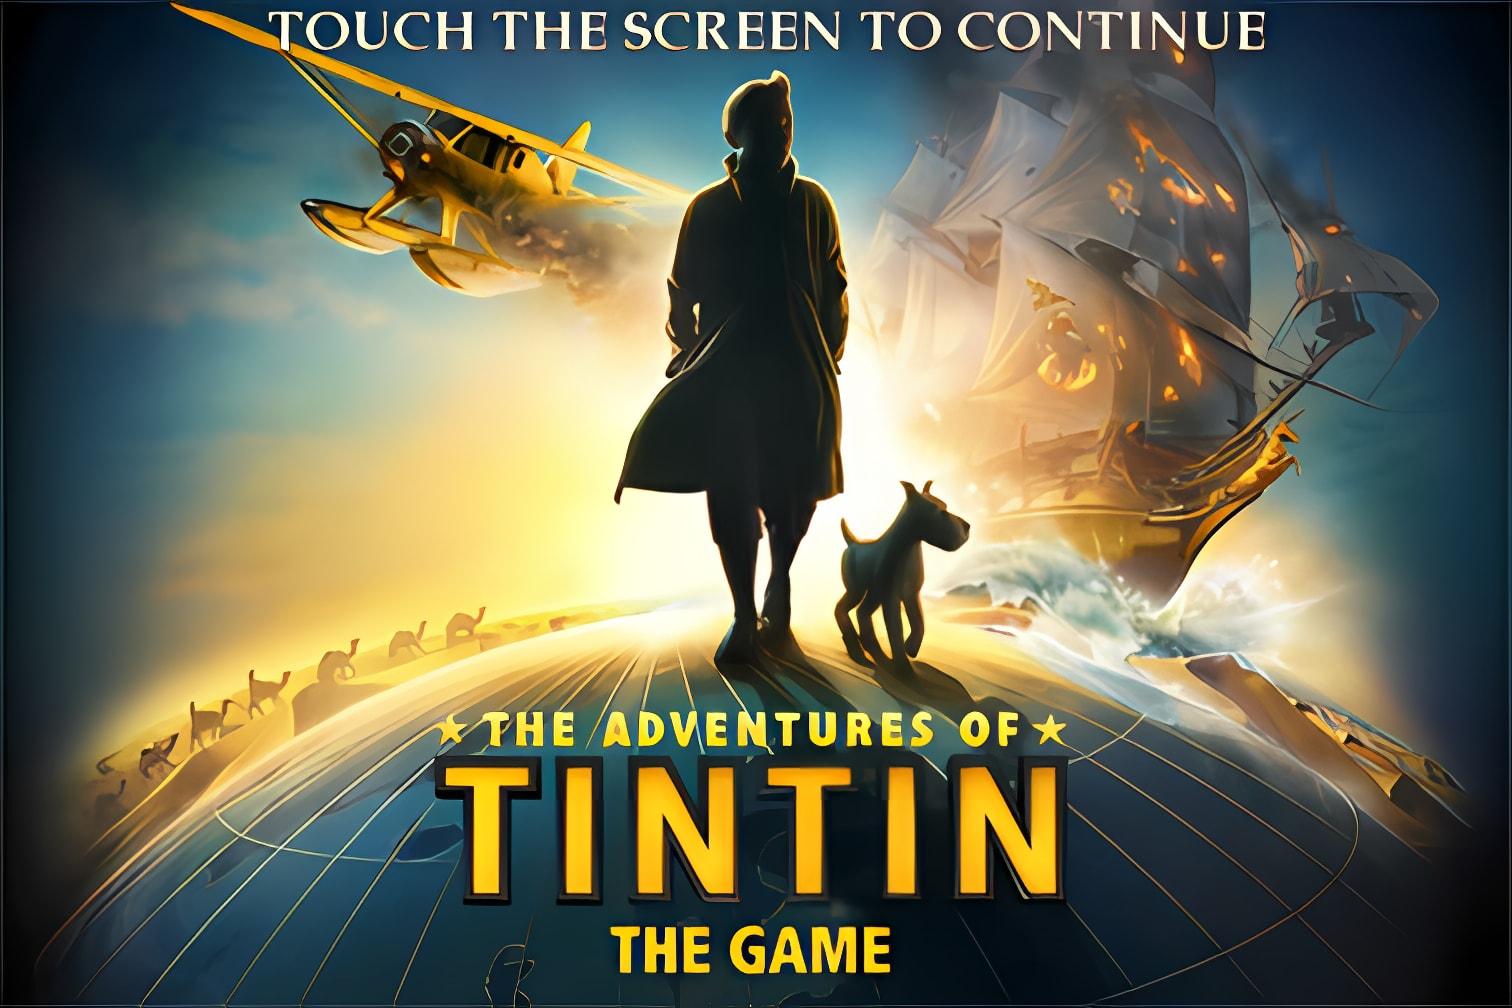 Las Aventuras de Tintín HD